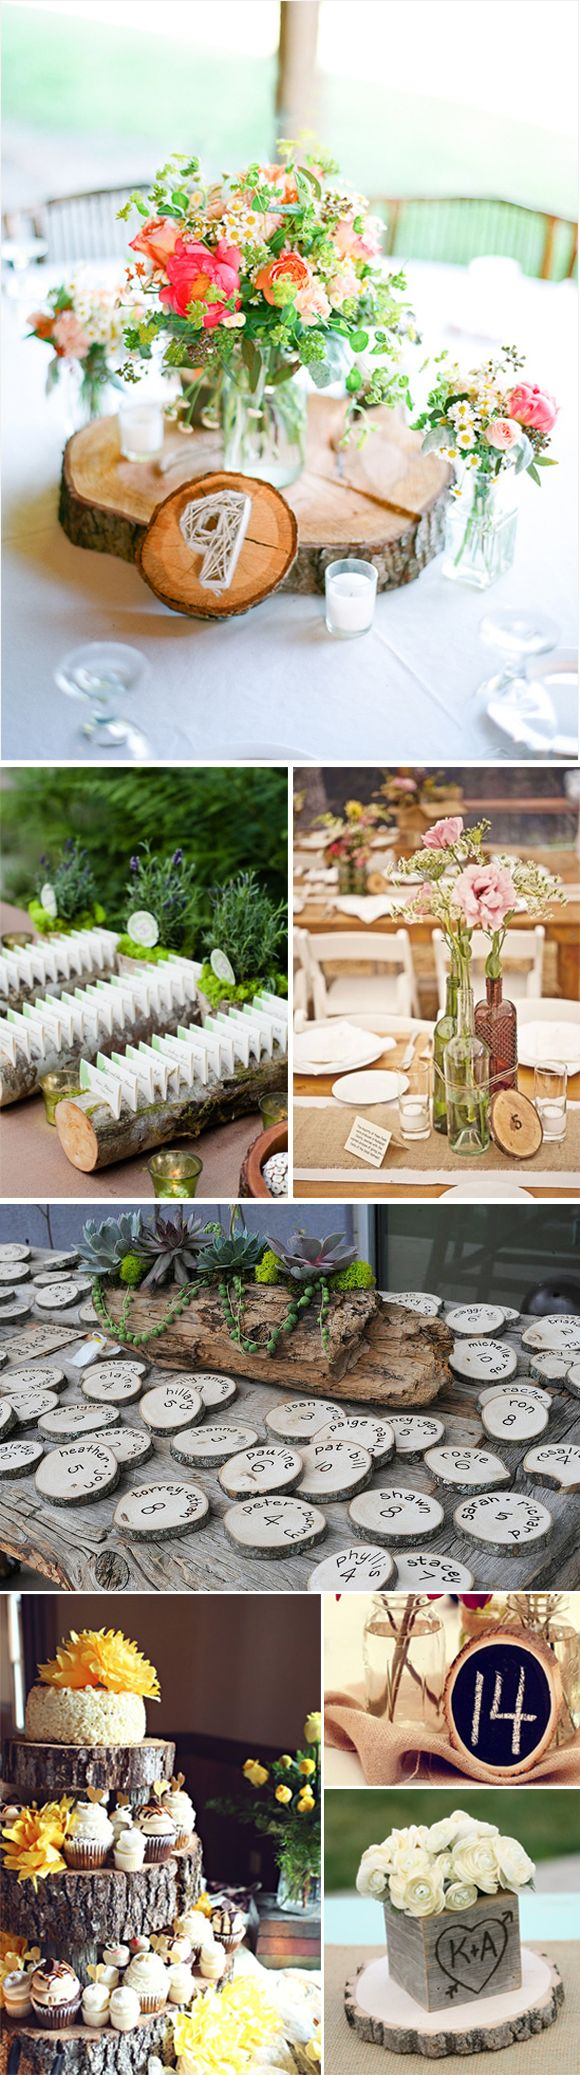 Decoracion de boda con troncos de madera ideas para tu - Troncos de madera para decorar ...